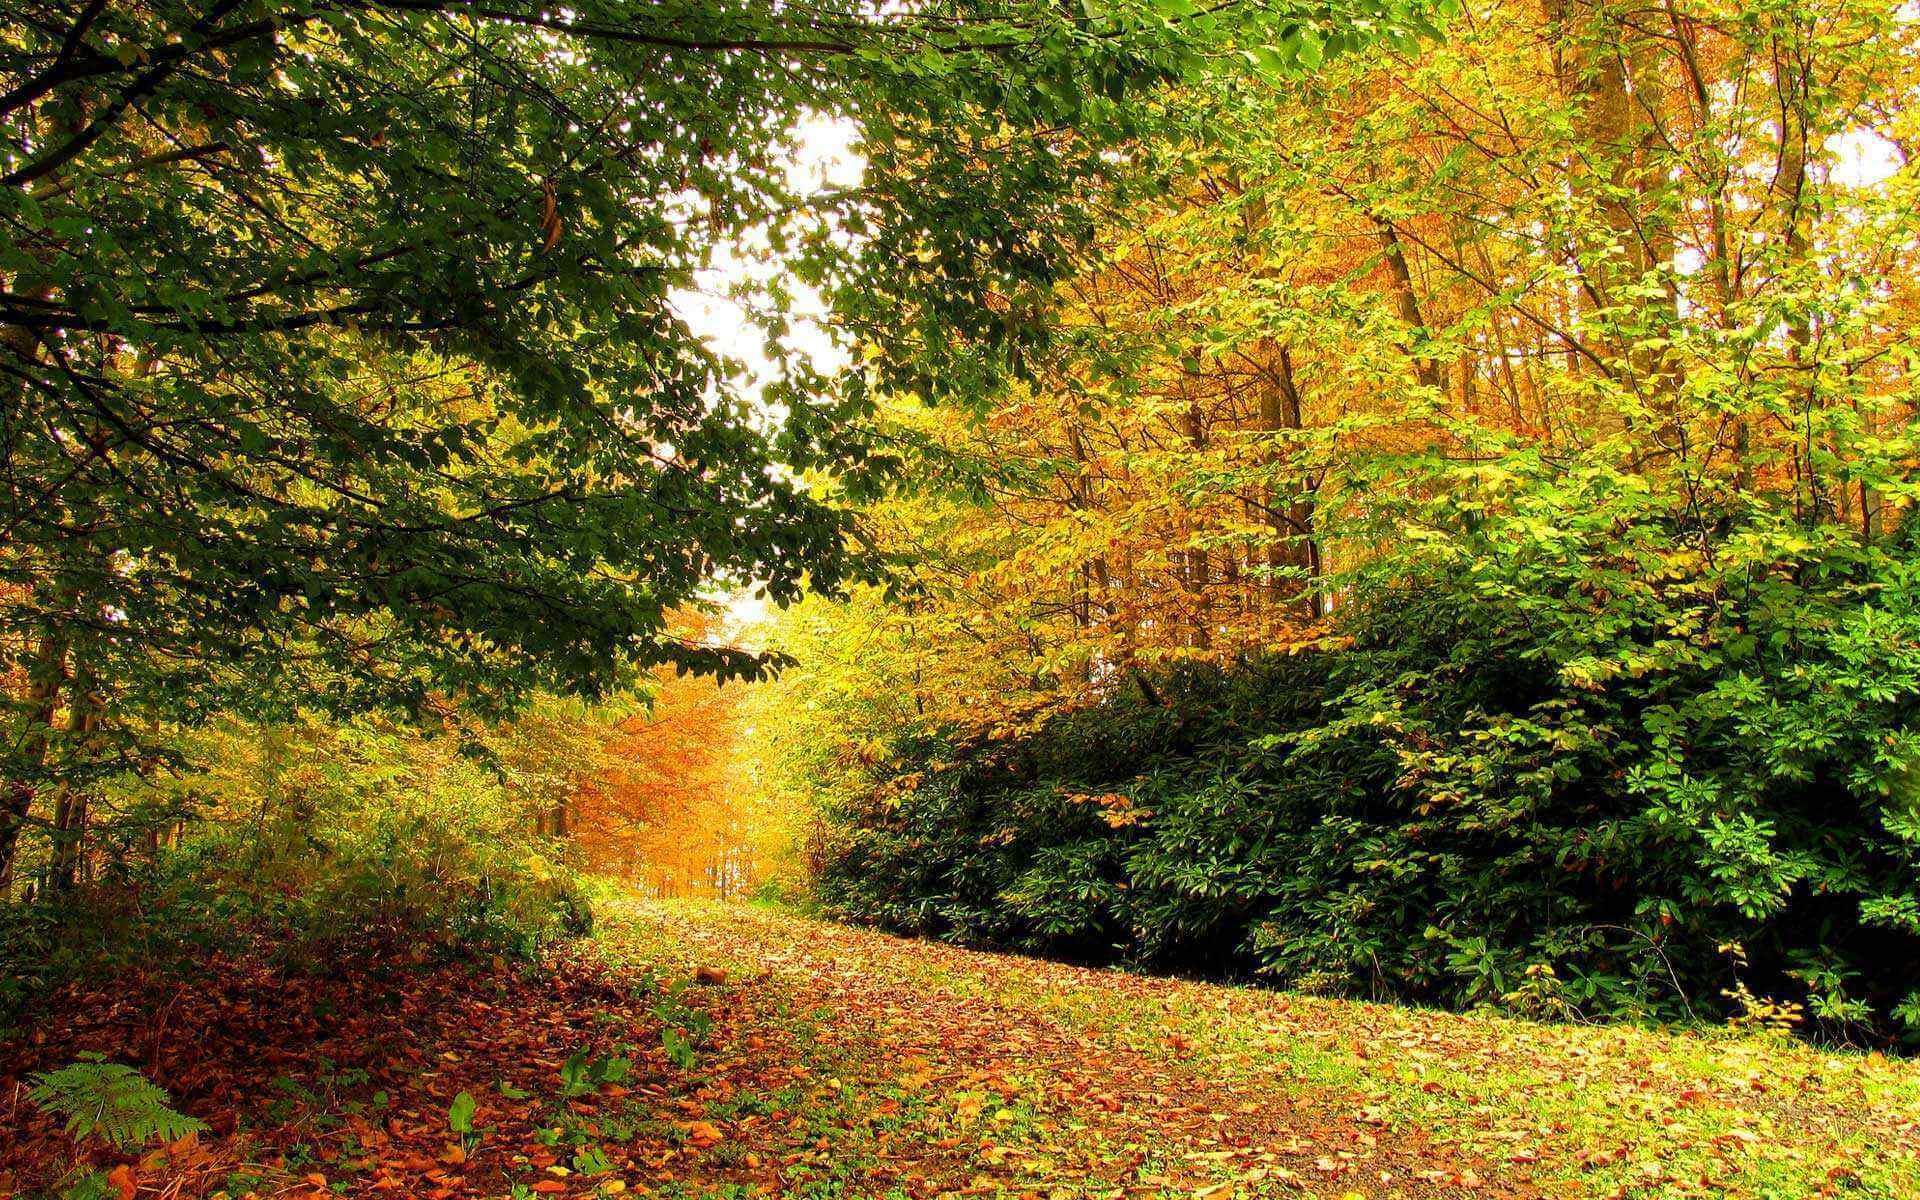 Sonbaharda Daday Ormanları